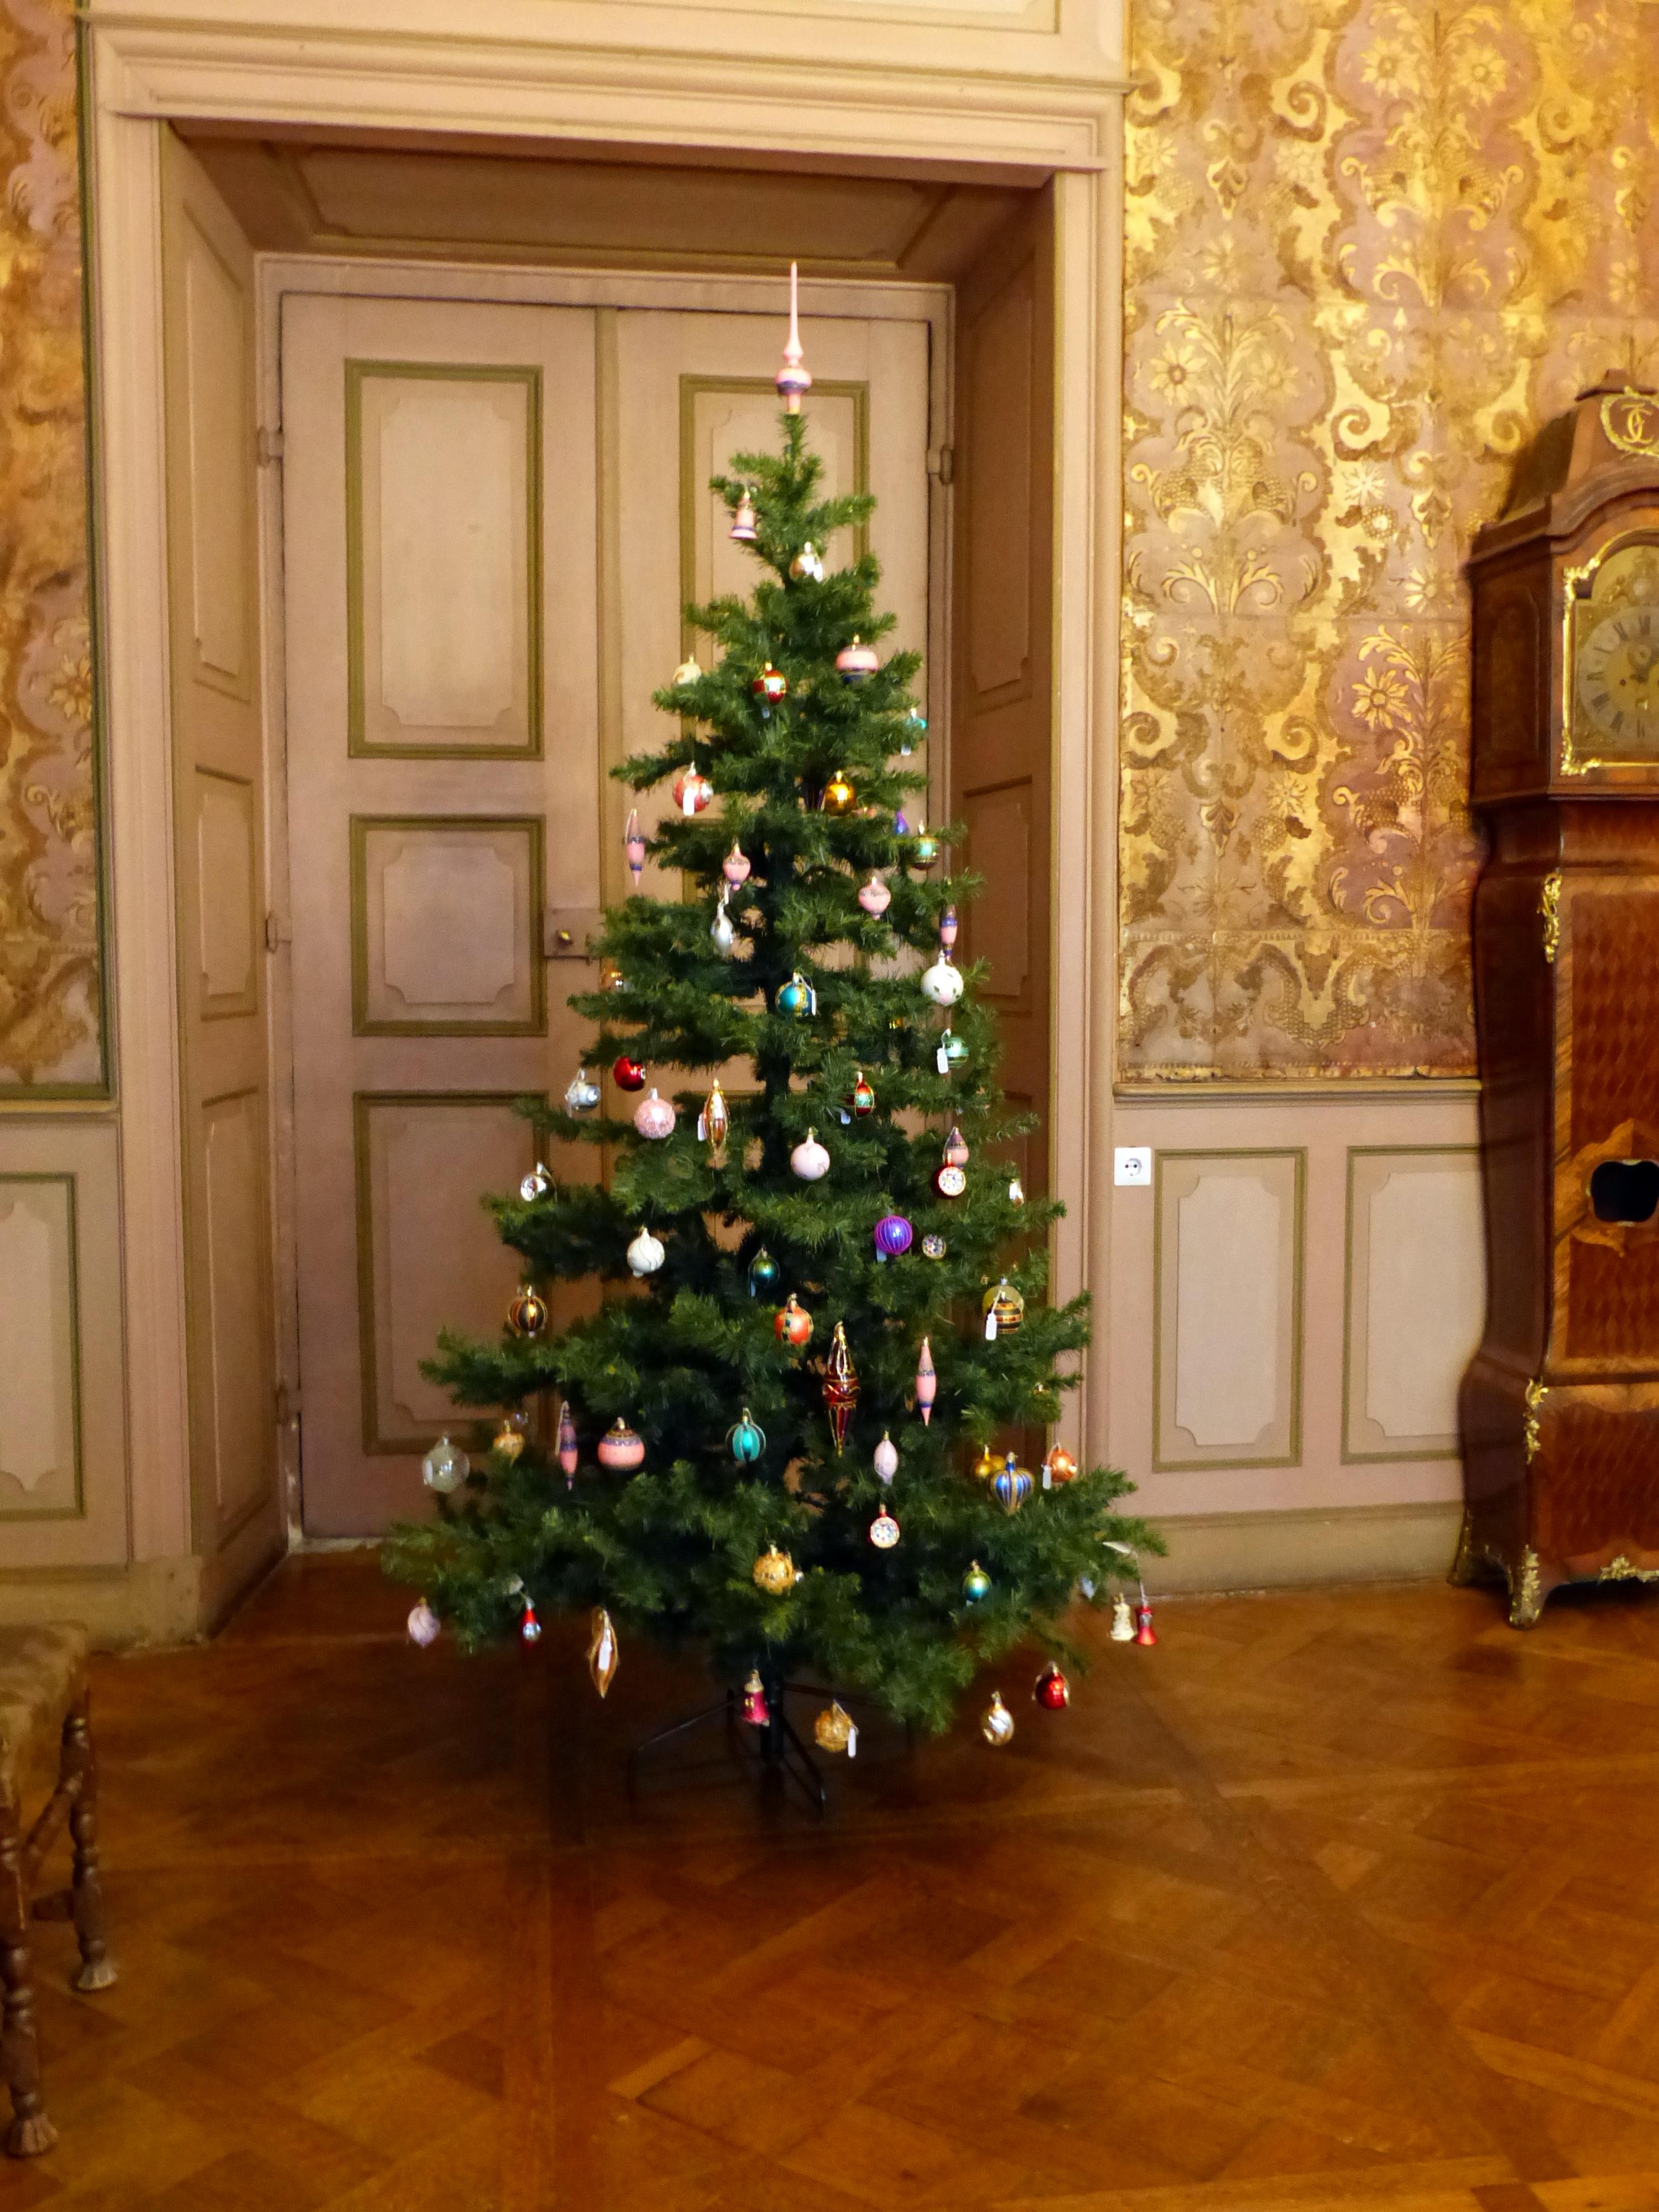 file weihnachtsbaum im schloss moritzburg jpg wikimedia. Black Bedroom Furniture Sets. Home Design Ideas